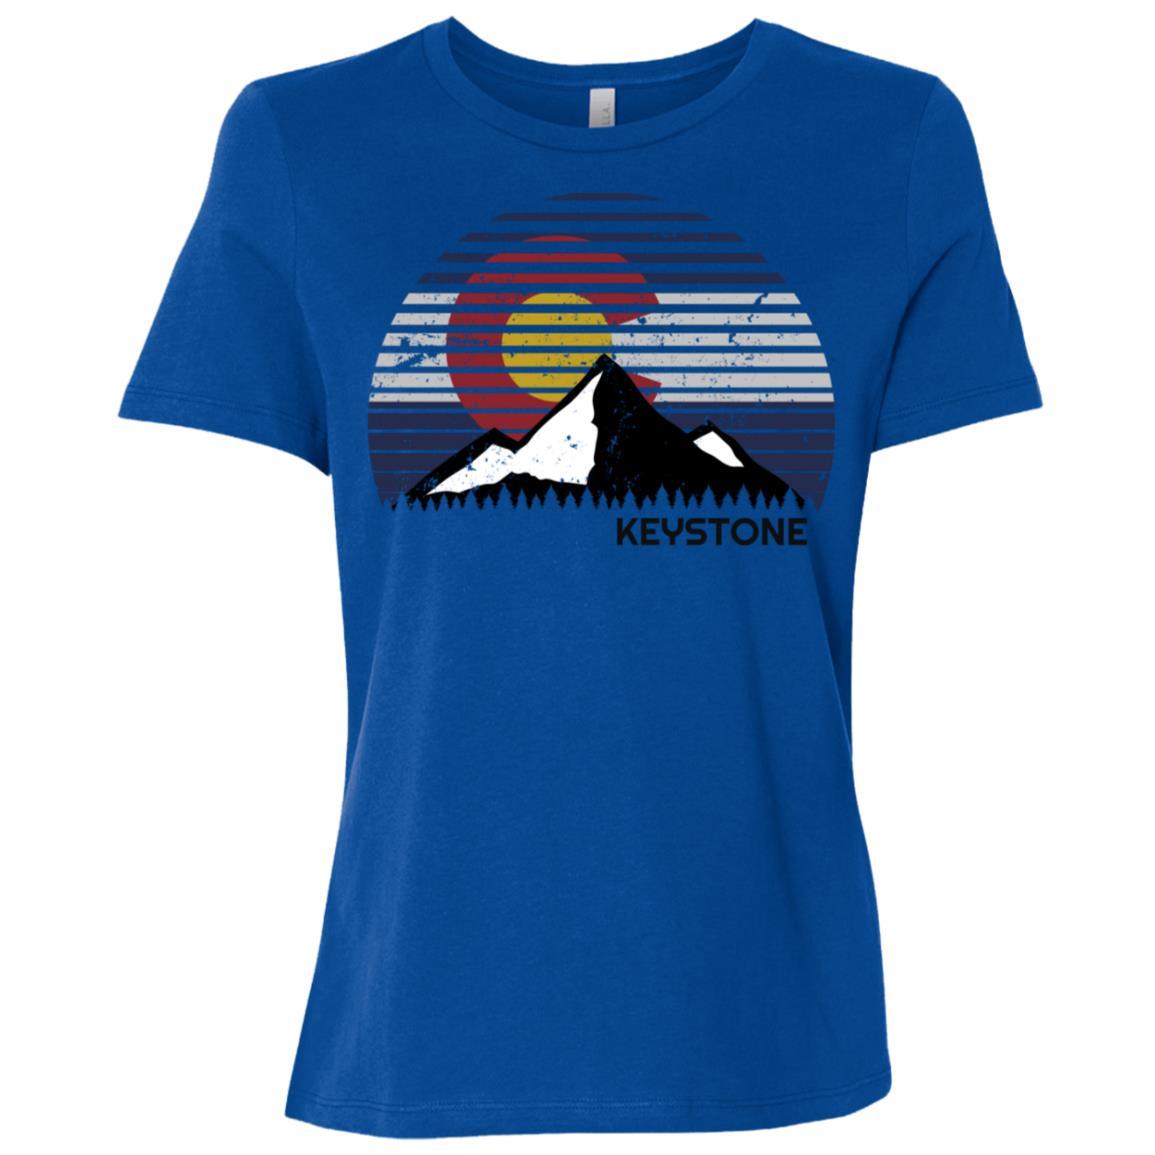 Keystone, Colorado x Co Flag Mtn Top Women Short Sleeve T-Shirt